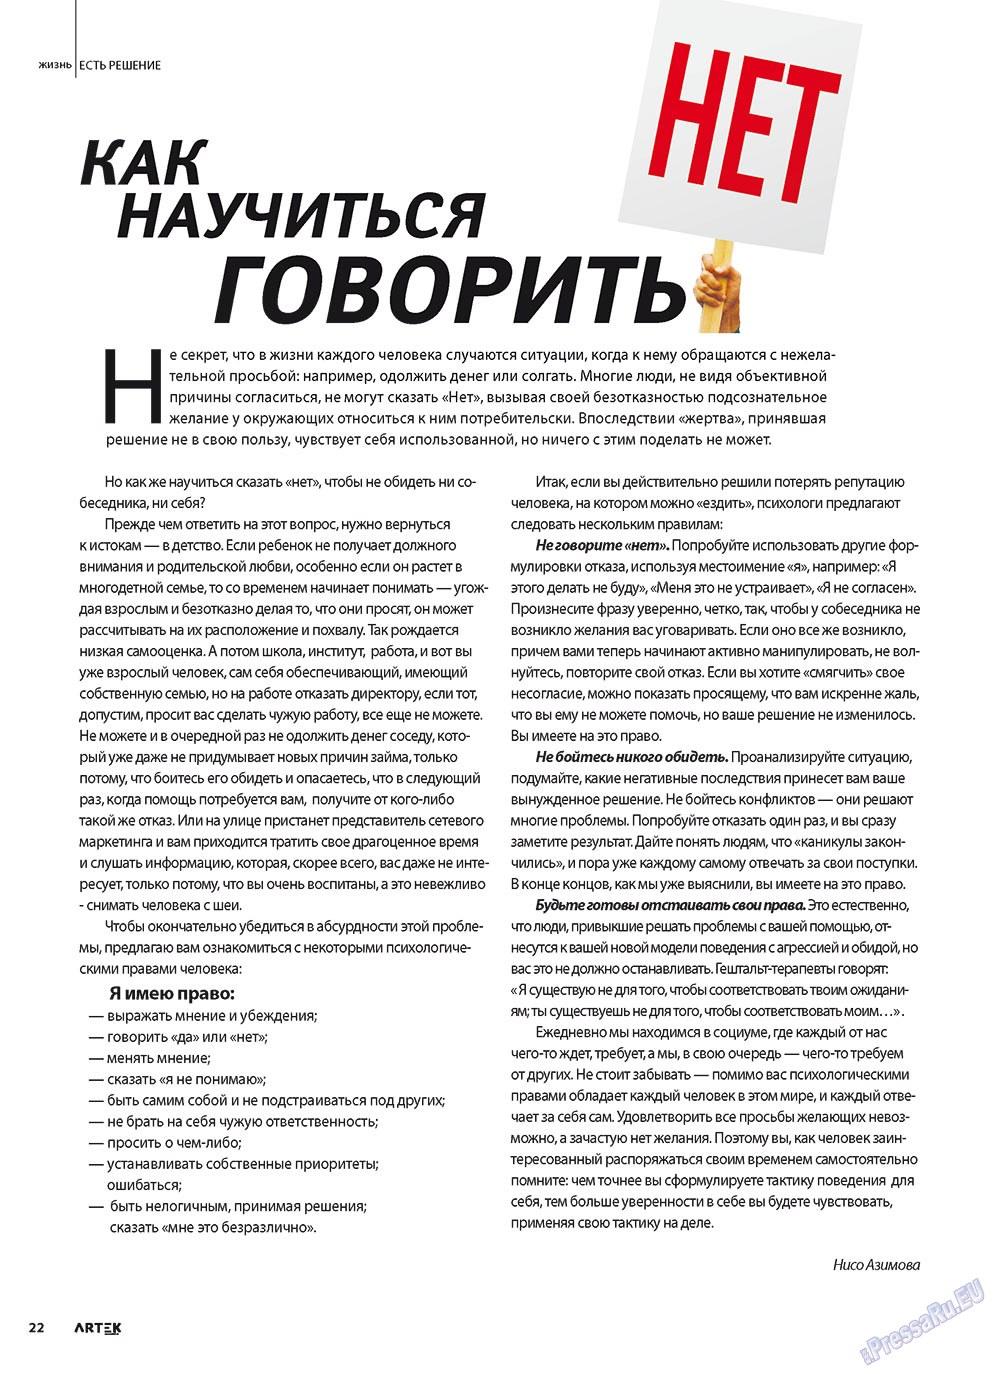 Артек (журнал). 2011 год, номер 2, стр. 24